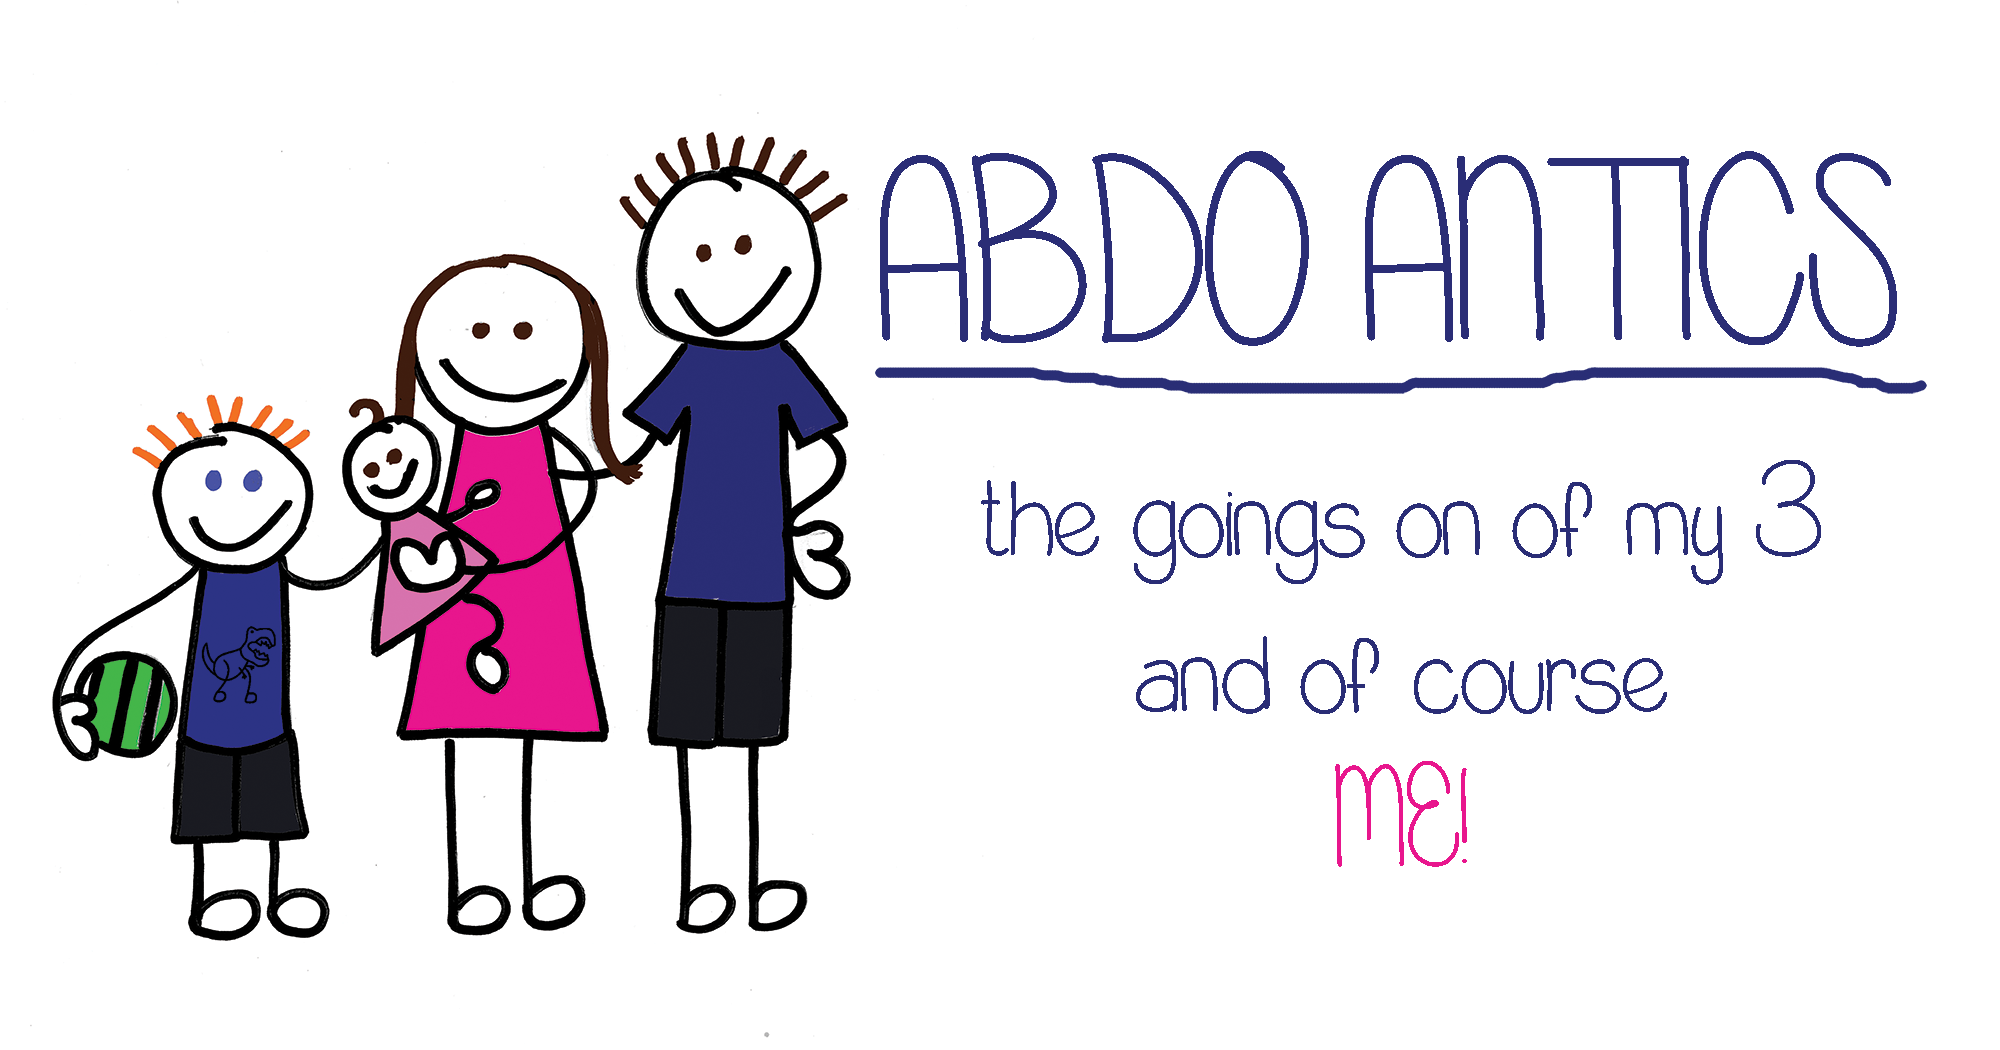 Abdoantics